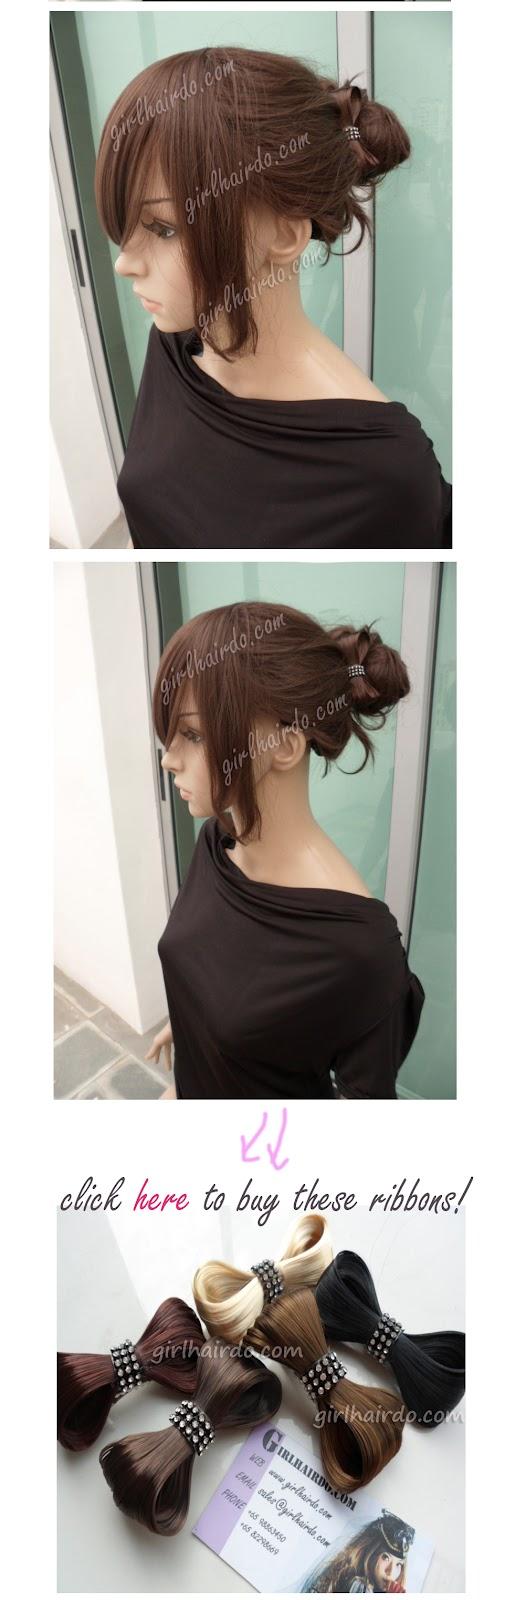 http://2.bp.blogspot.com/-32c3nr1kEys/T6GLxAJ3ehI/AAAAAAAAHcY/3_ltuVR2K6g/s1600/1b.jpg